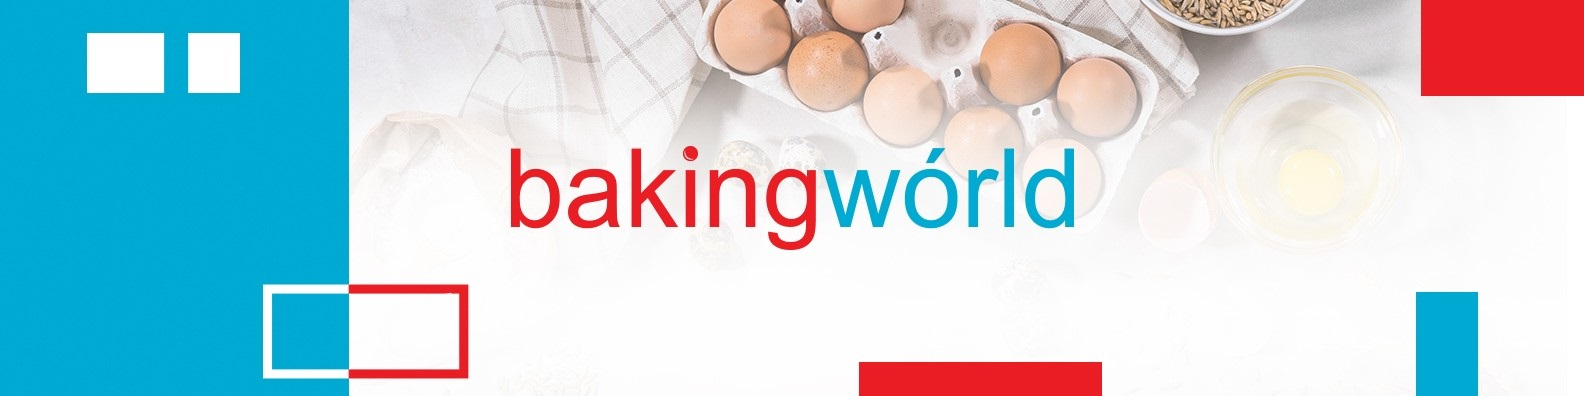 Cara praktis dan lancar menonton memasak lewat BakingWorld.id